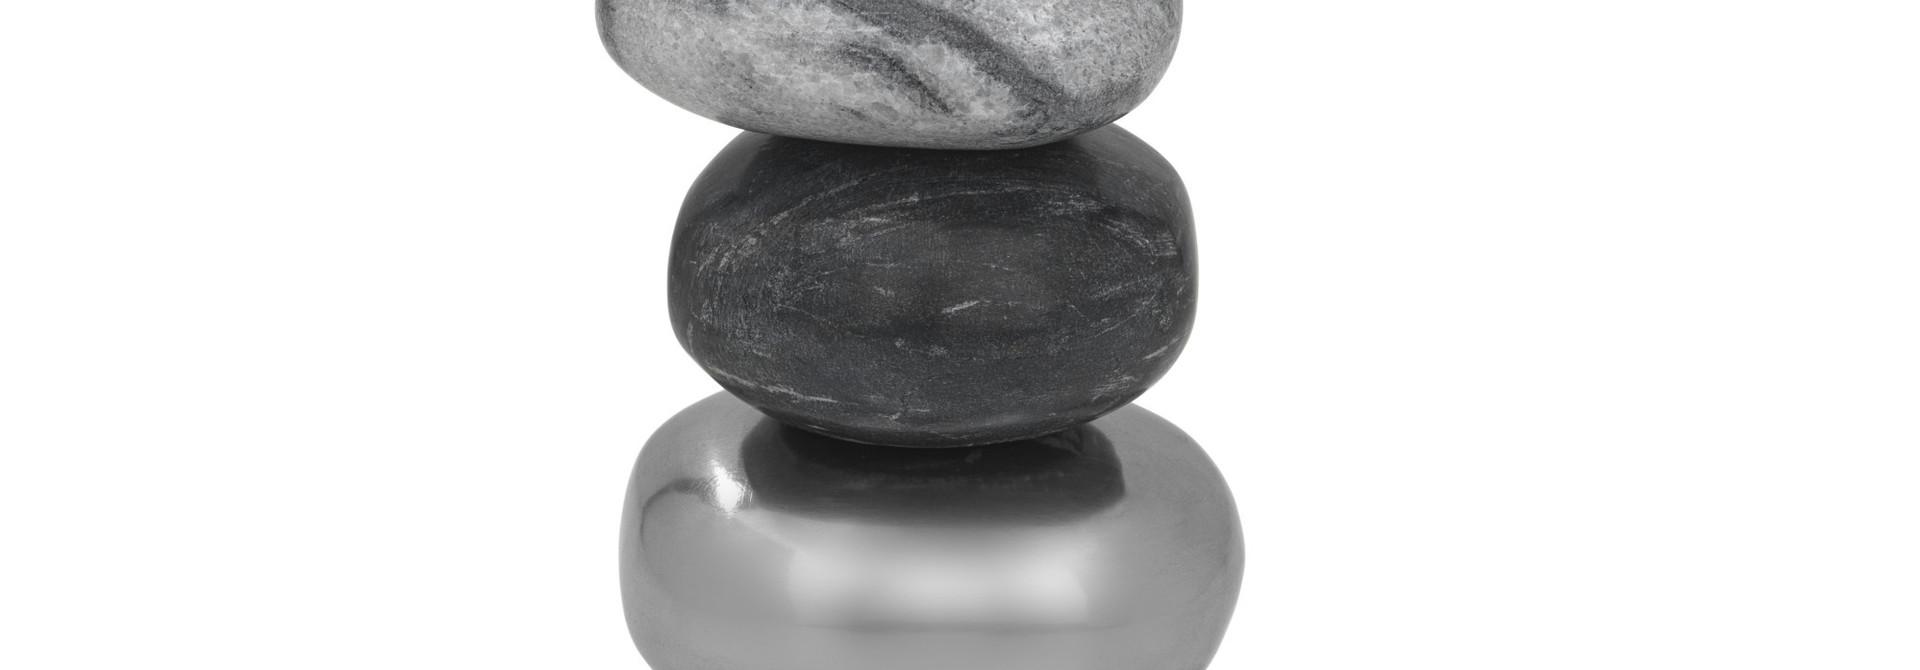 Rock Pile Sculpture